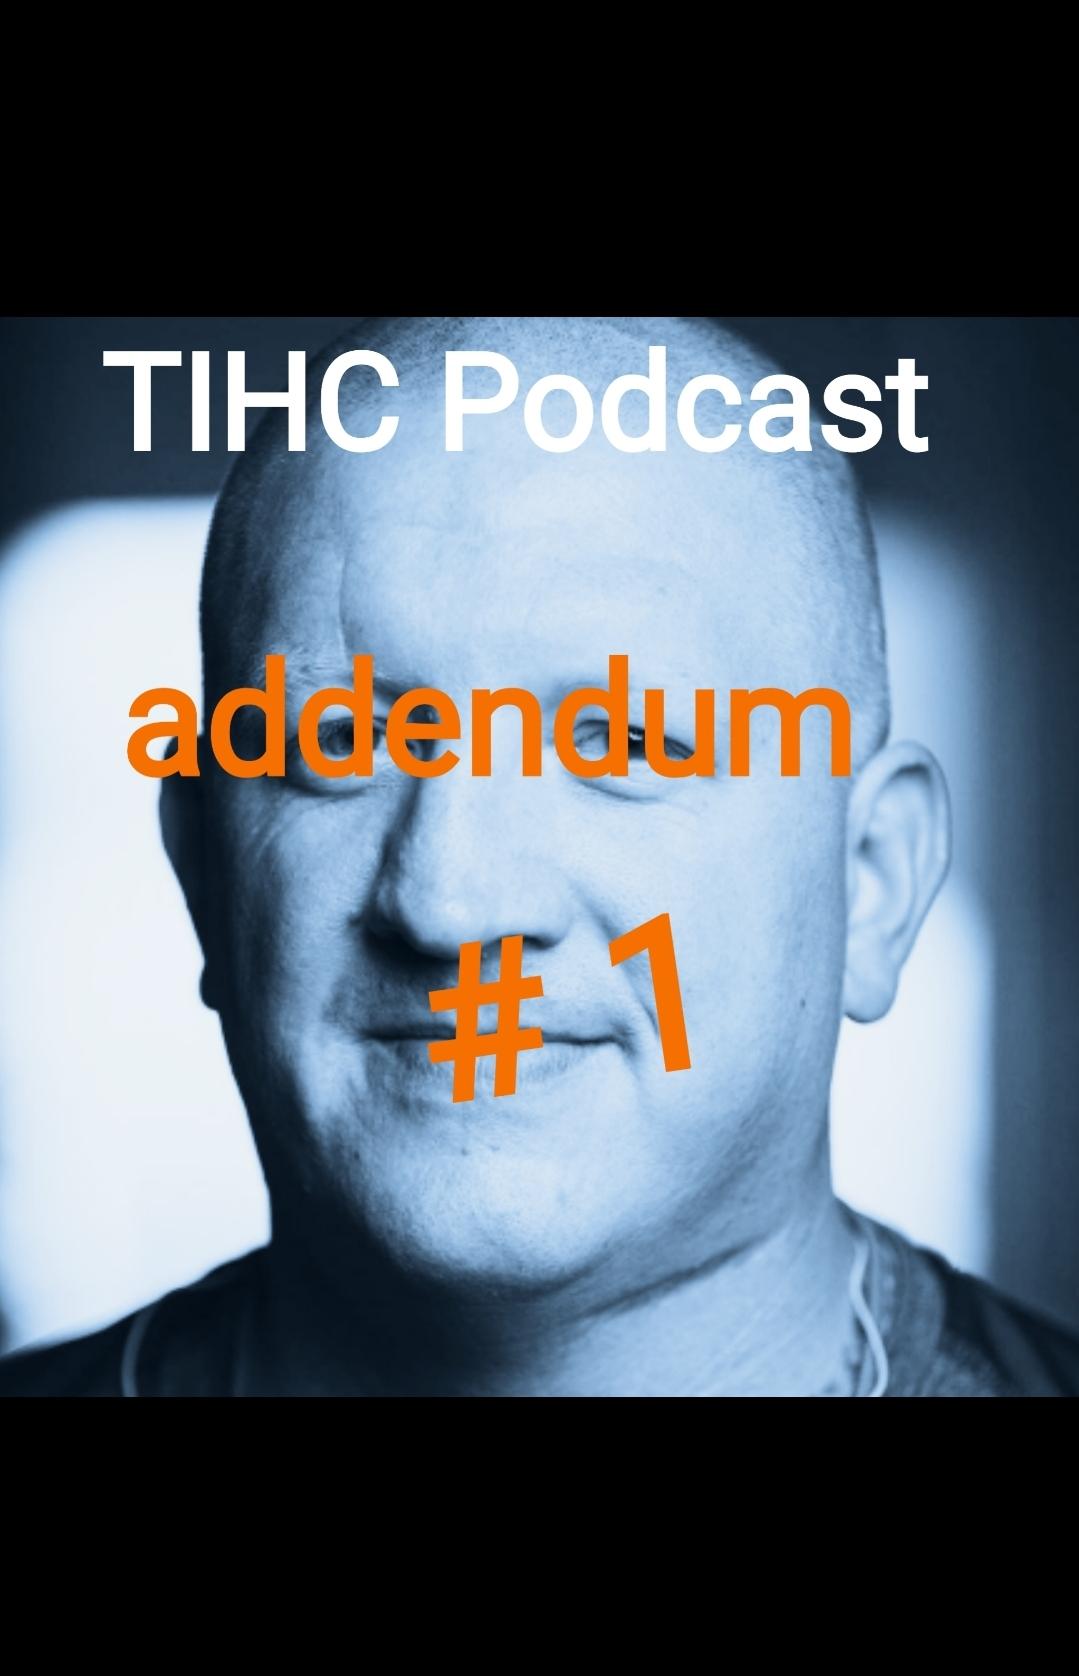 image for Addendum No. 1